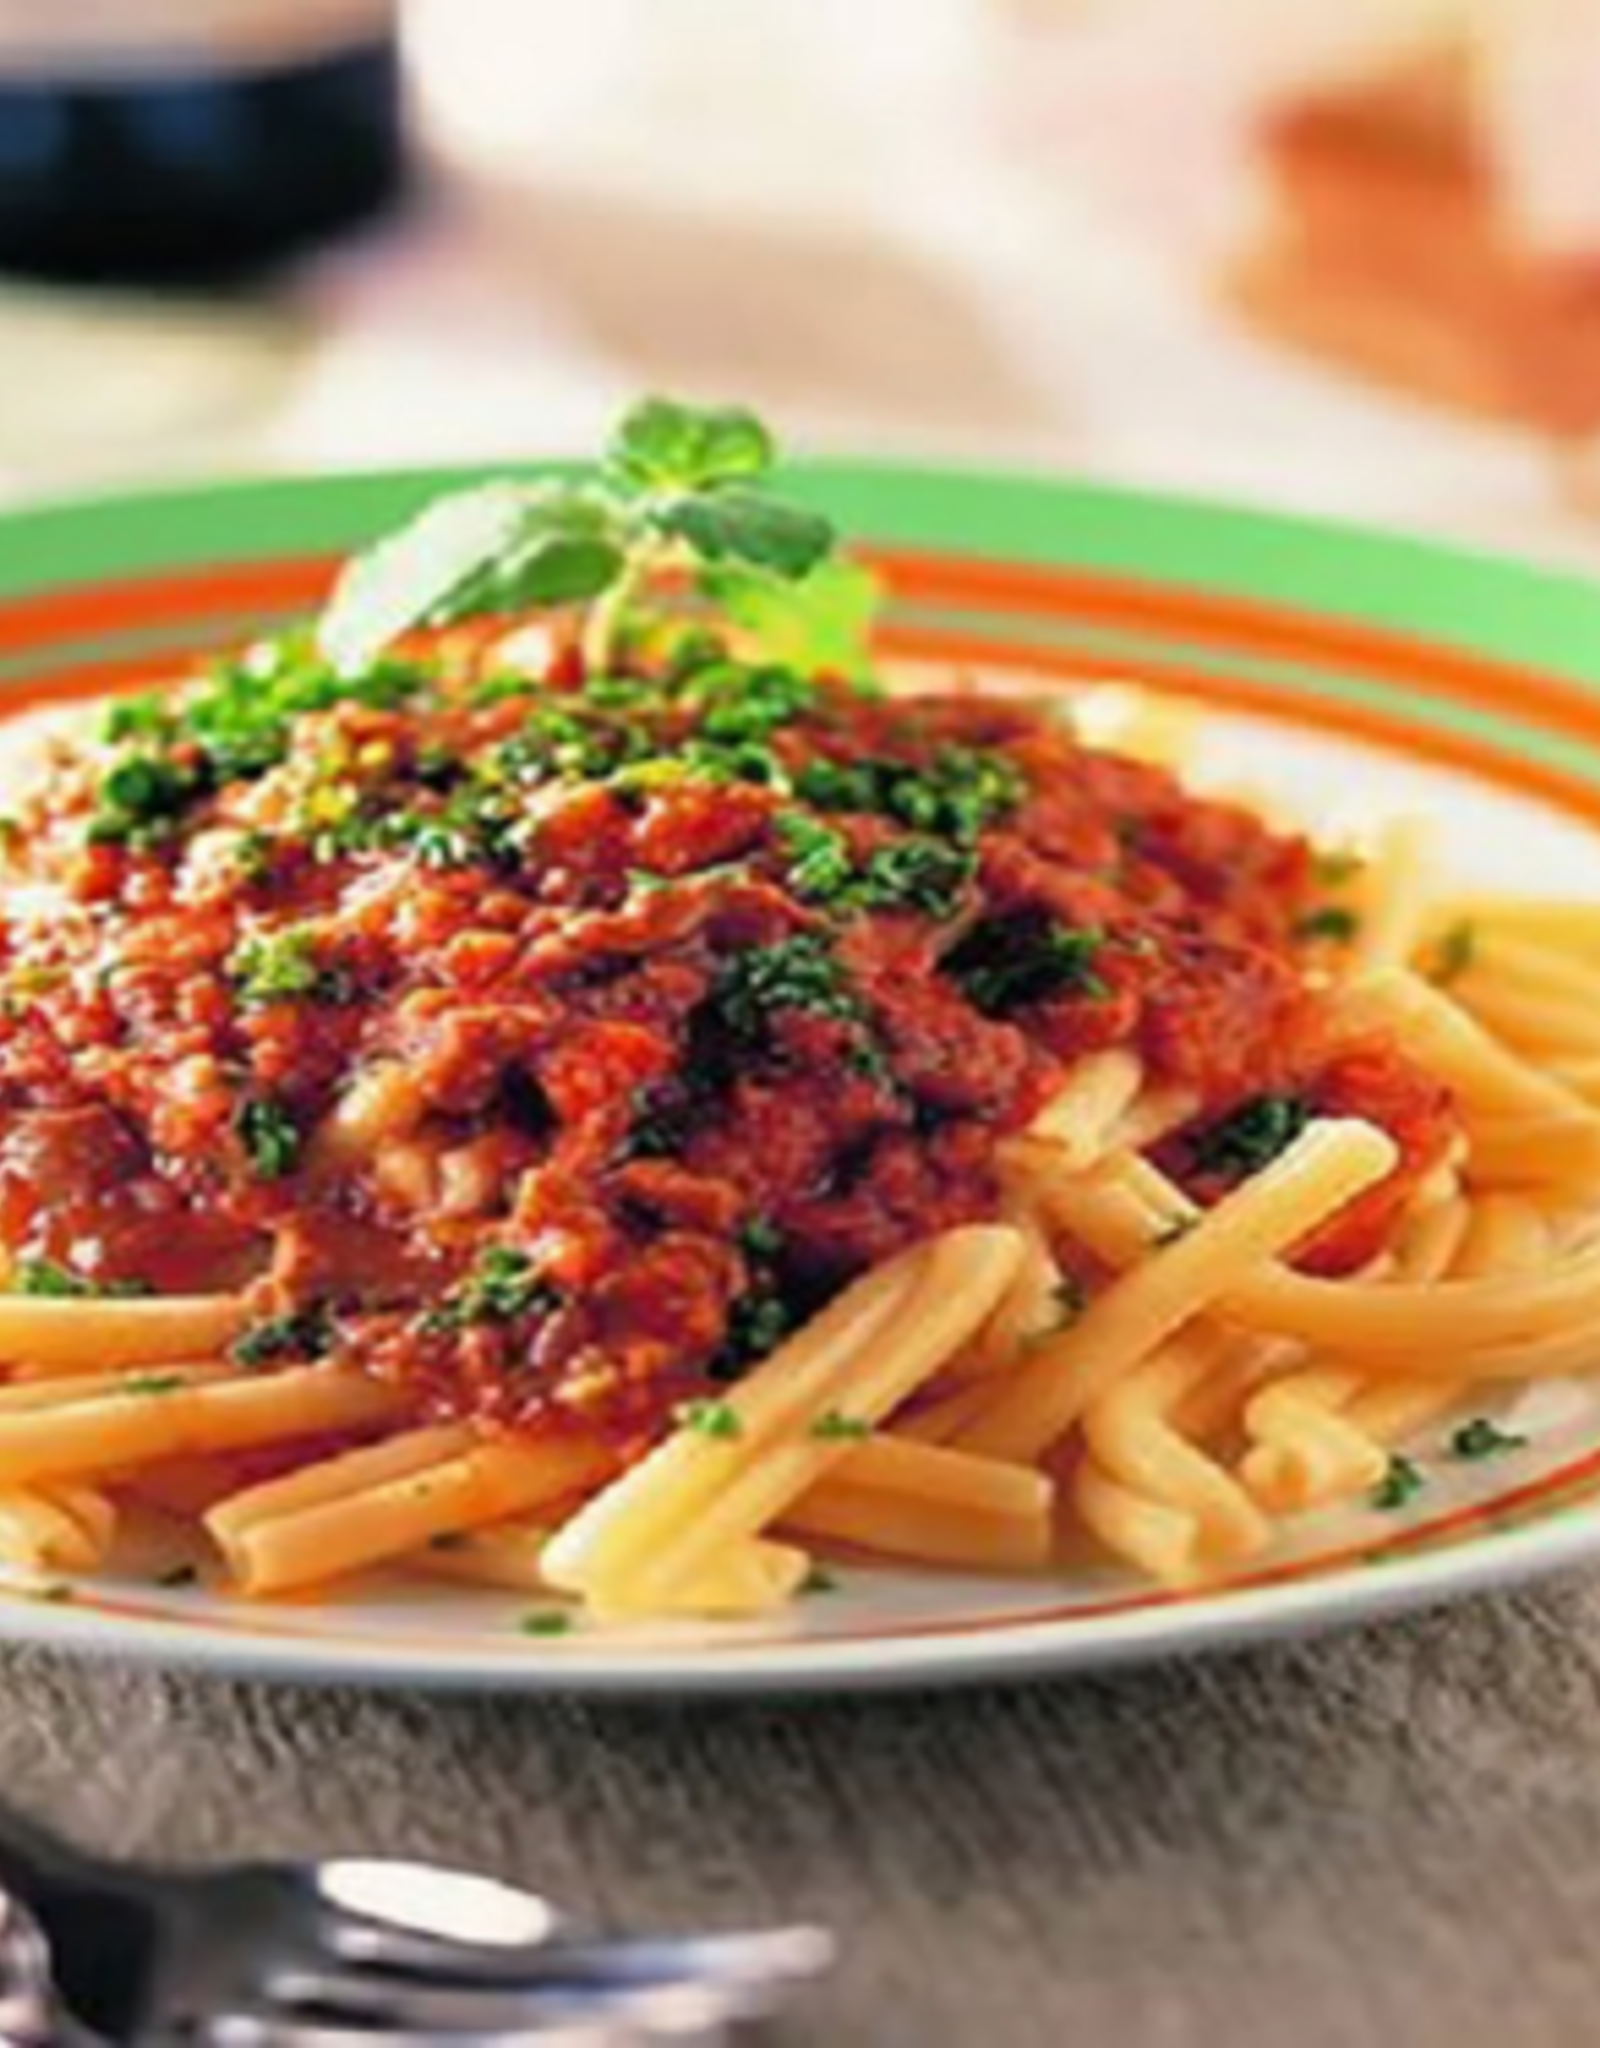 Vegefarm * 松珍 (VF) Vege Spaghetti Sause*(松珍) 素義大利醬